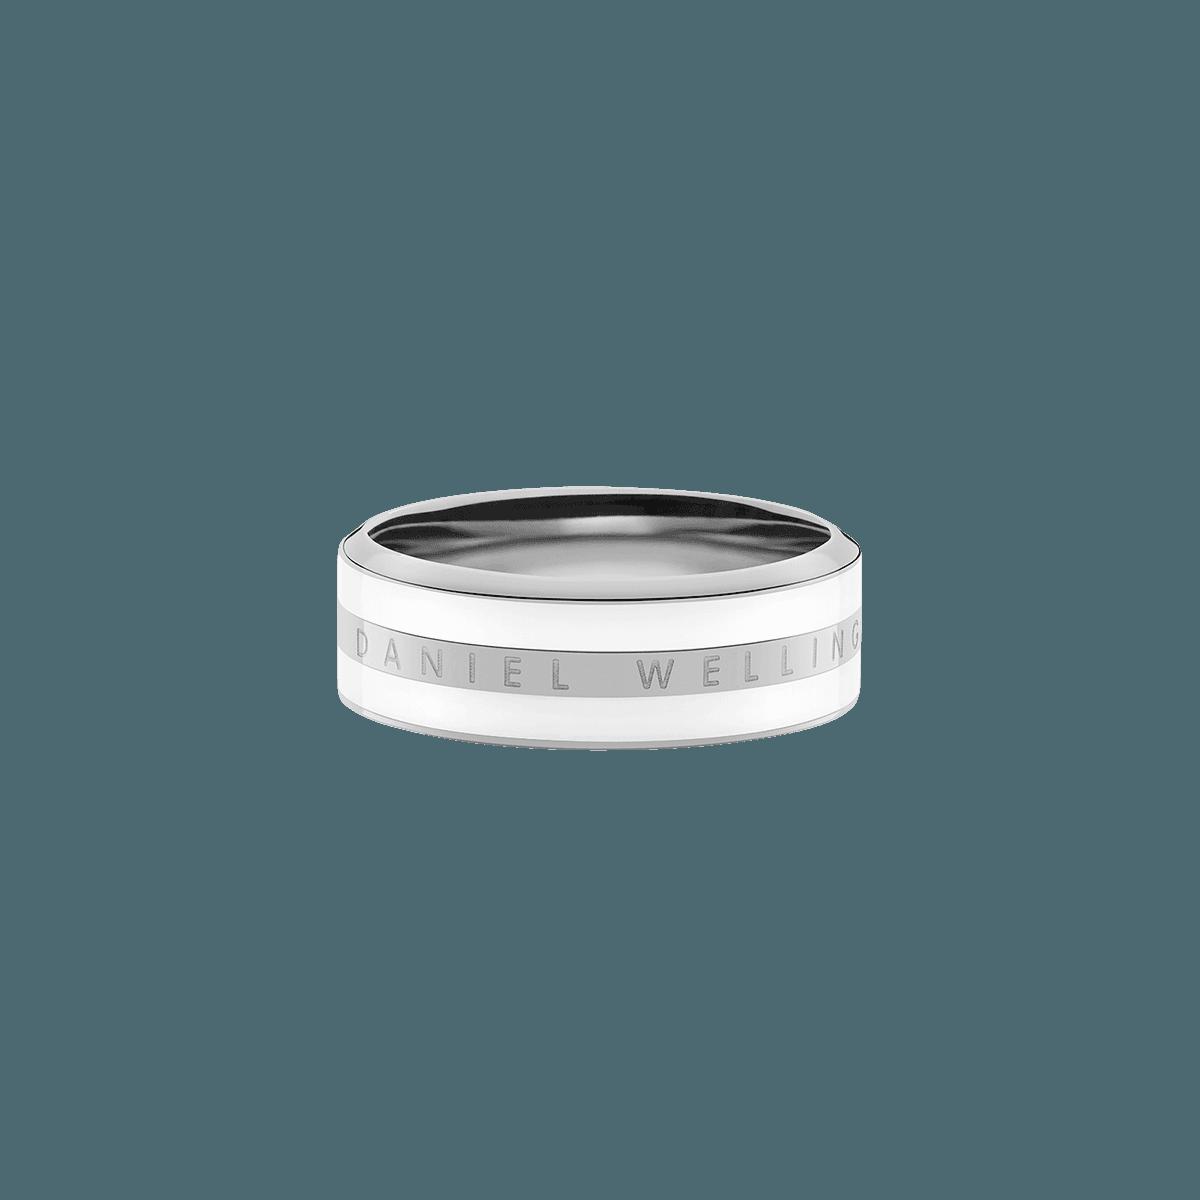 dw官网 dw手表官网 dw中国官网 dw官方旗舰店 DW DW官网  Classic Ring Satin White Silver 48mm